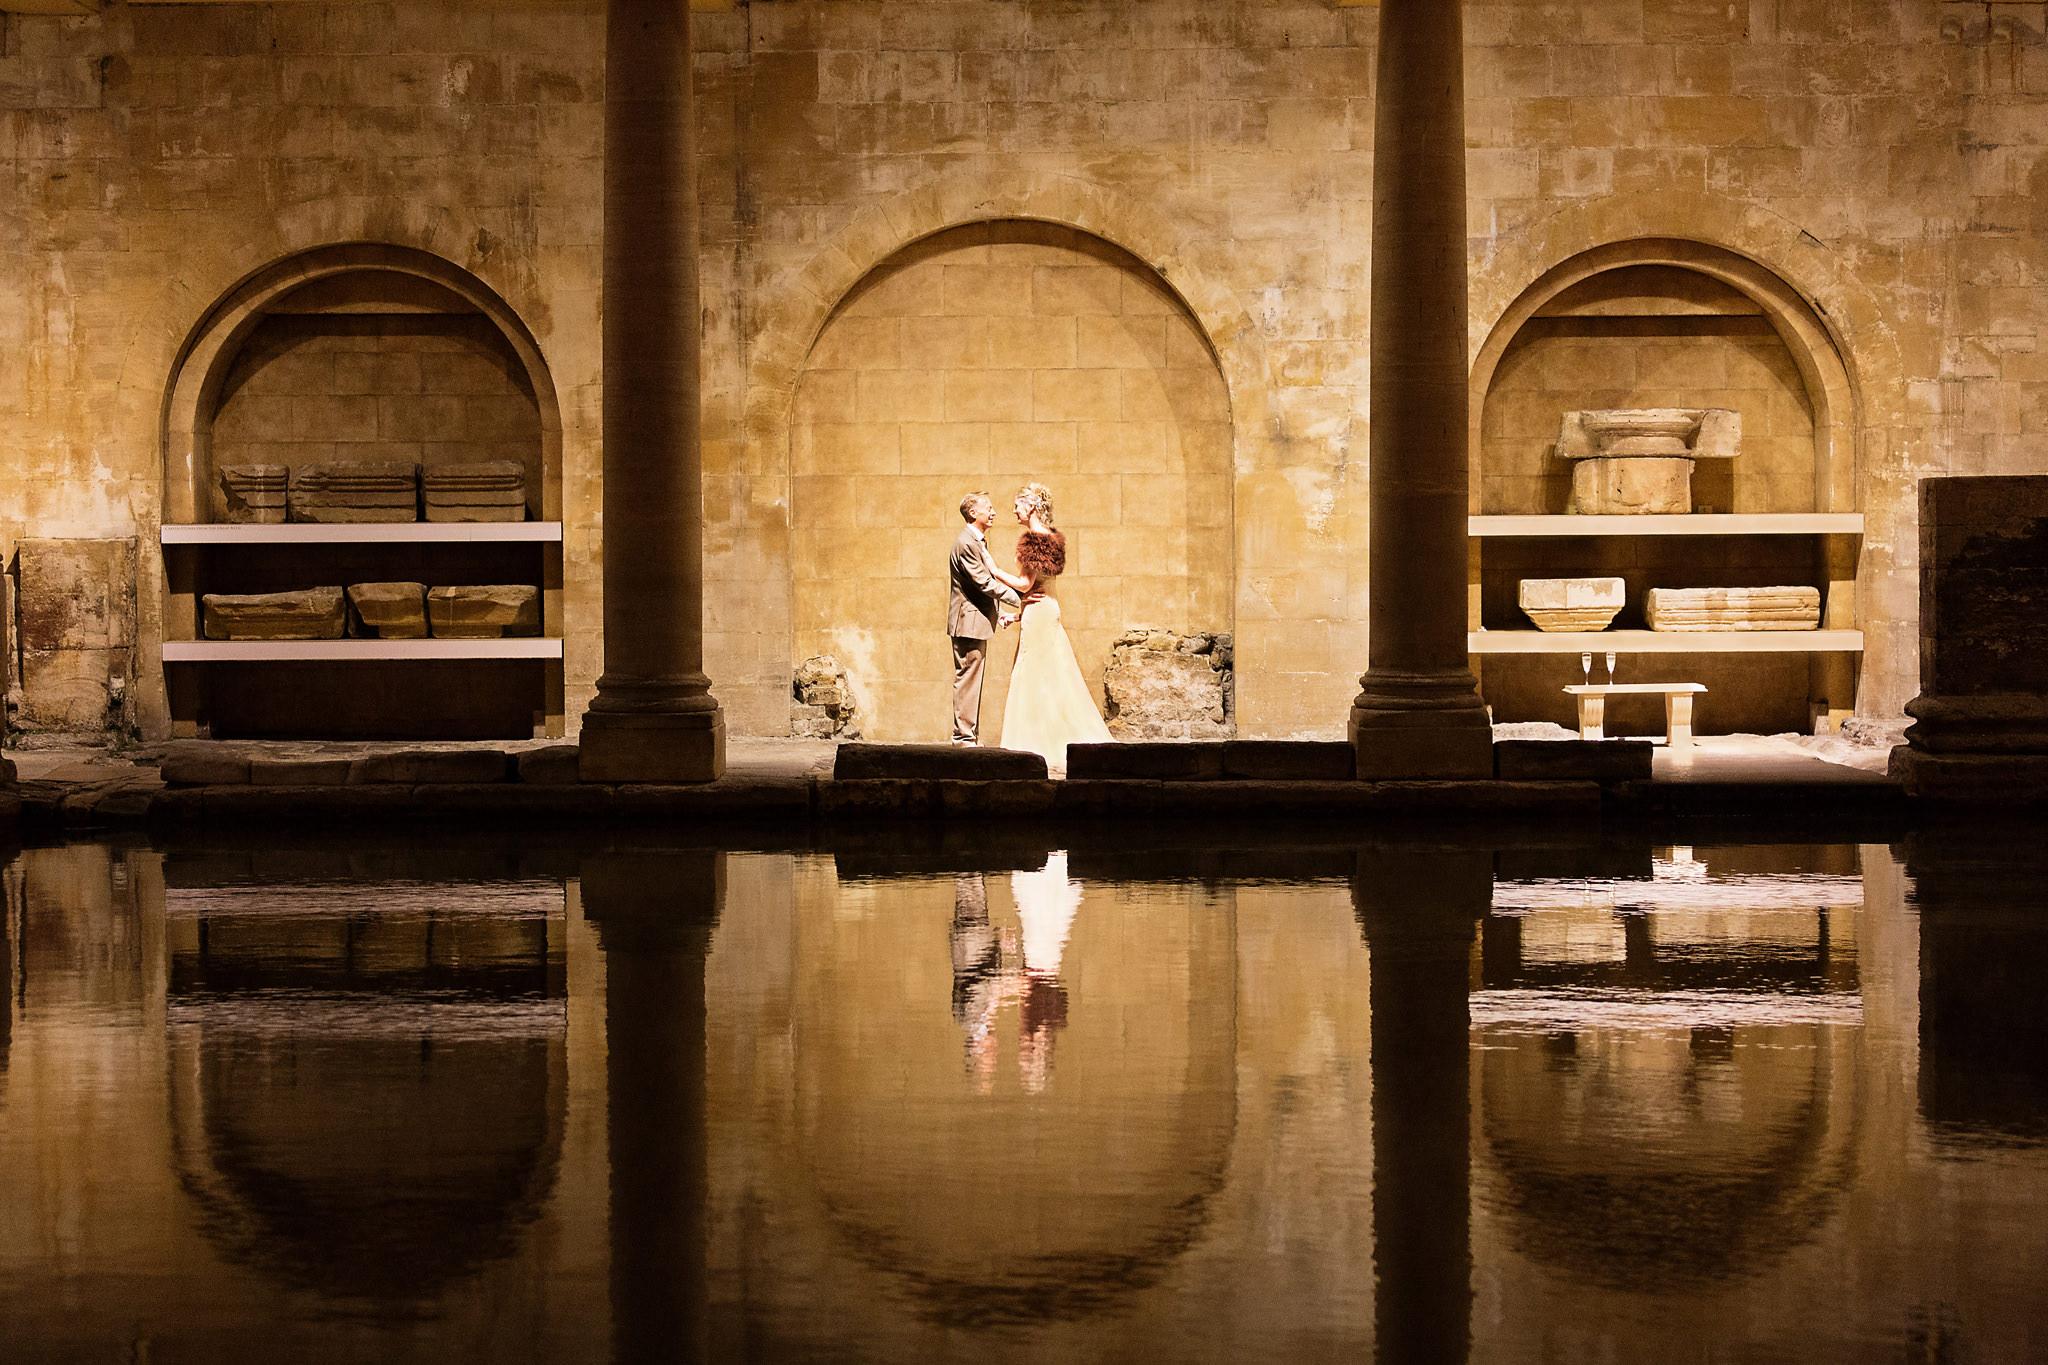 Roman Baths for wedding photography